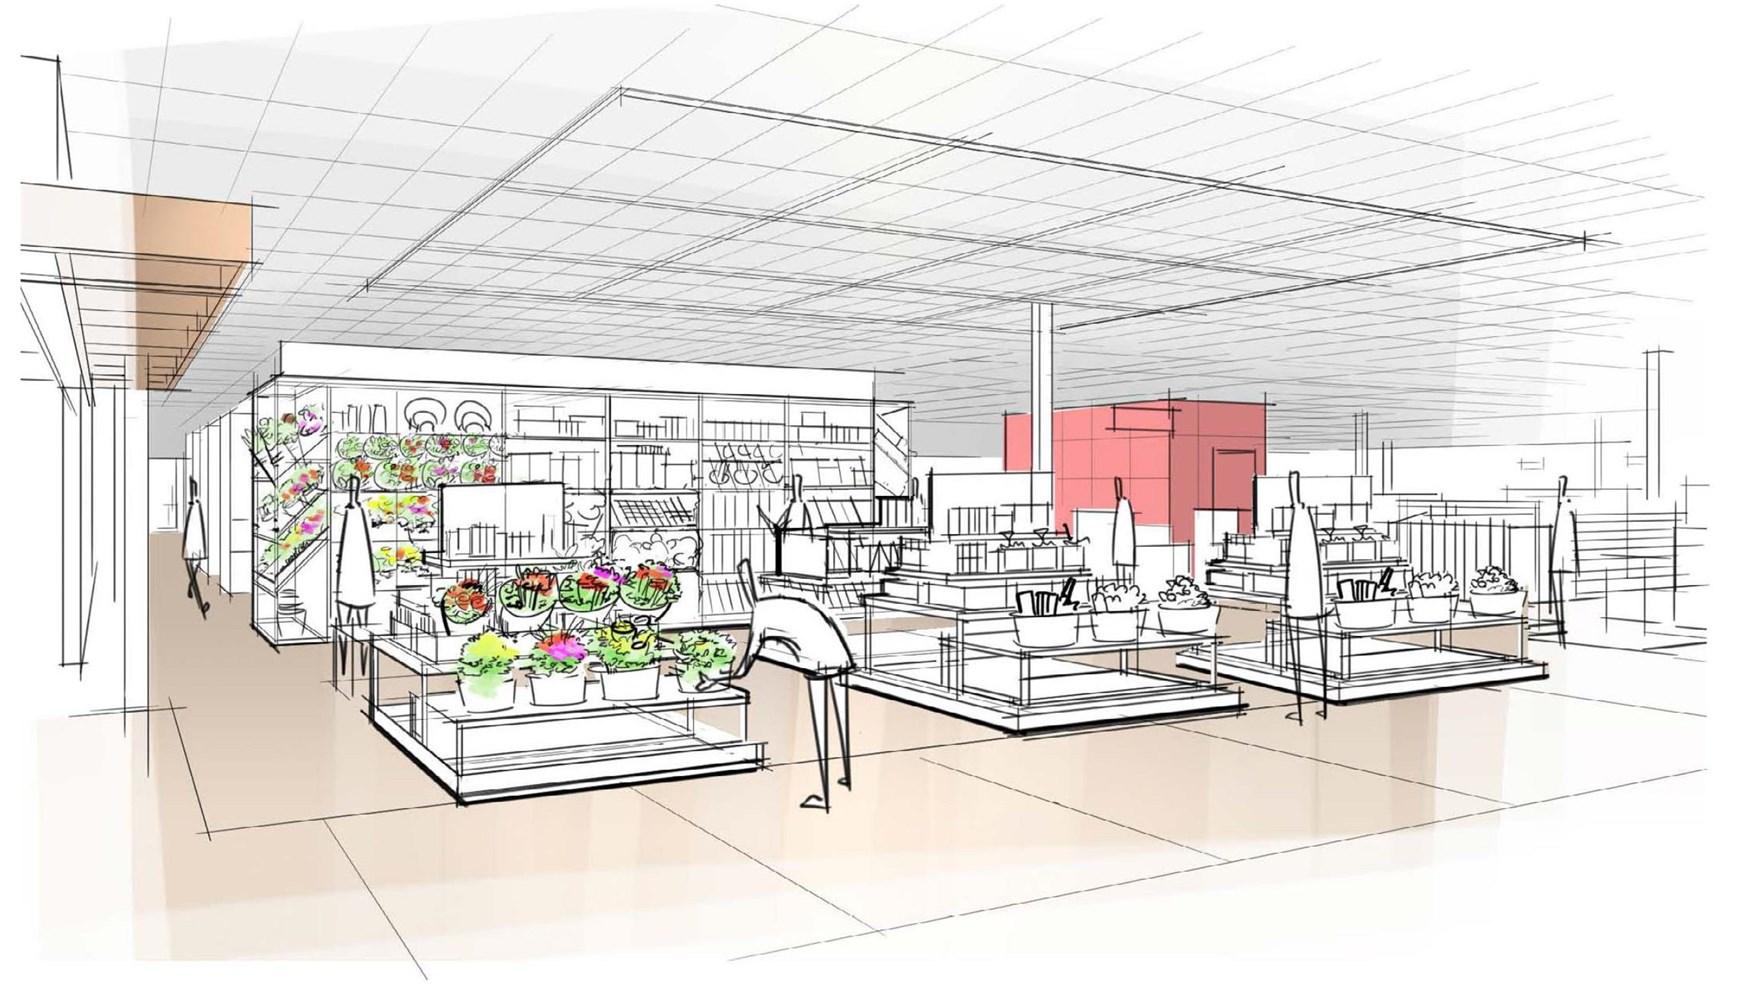 target reveals design elements of next generation of stores next generation target store design 6